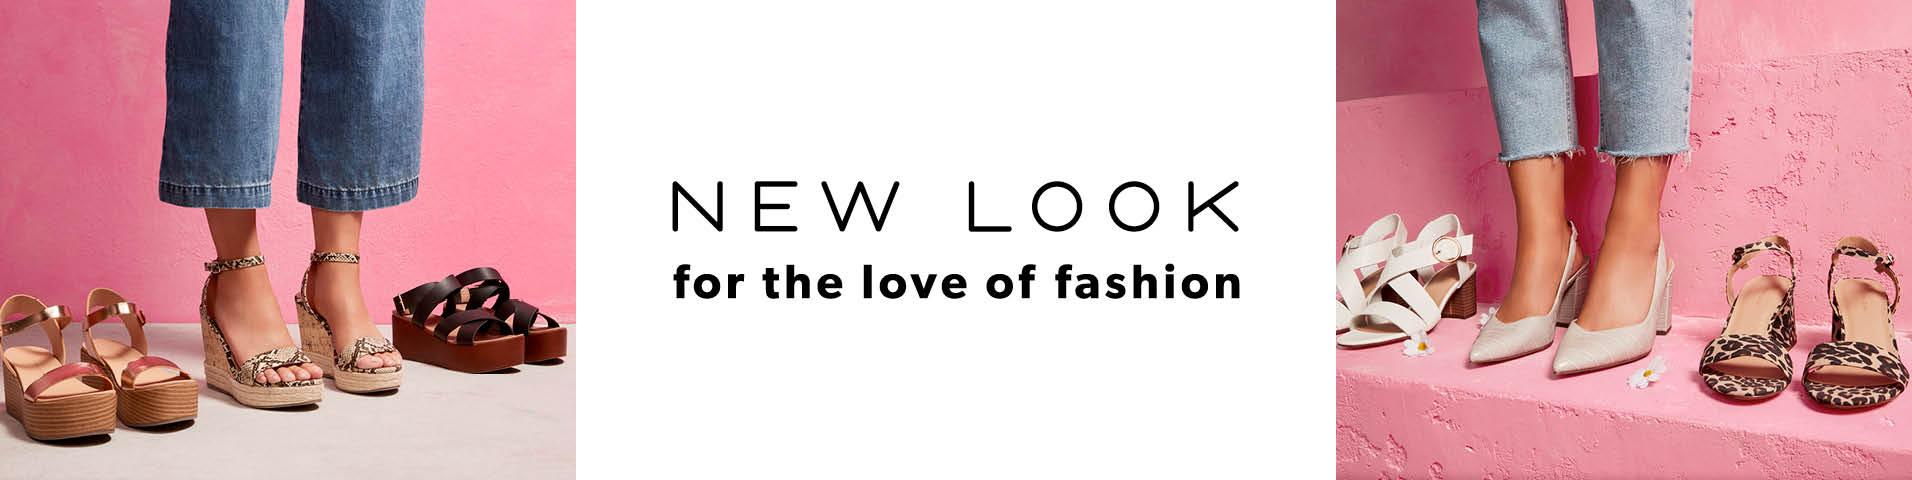 927eabc0f2a New Look Women's Shoes | Mules to Block Heels | ZALANDO UK